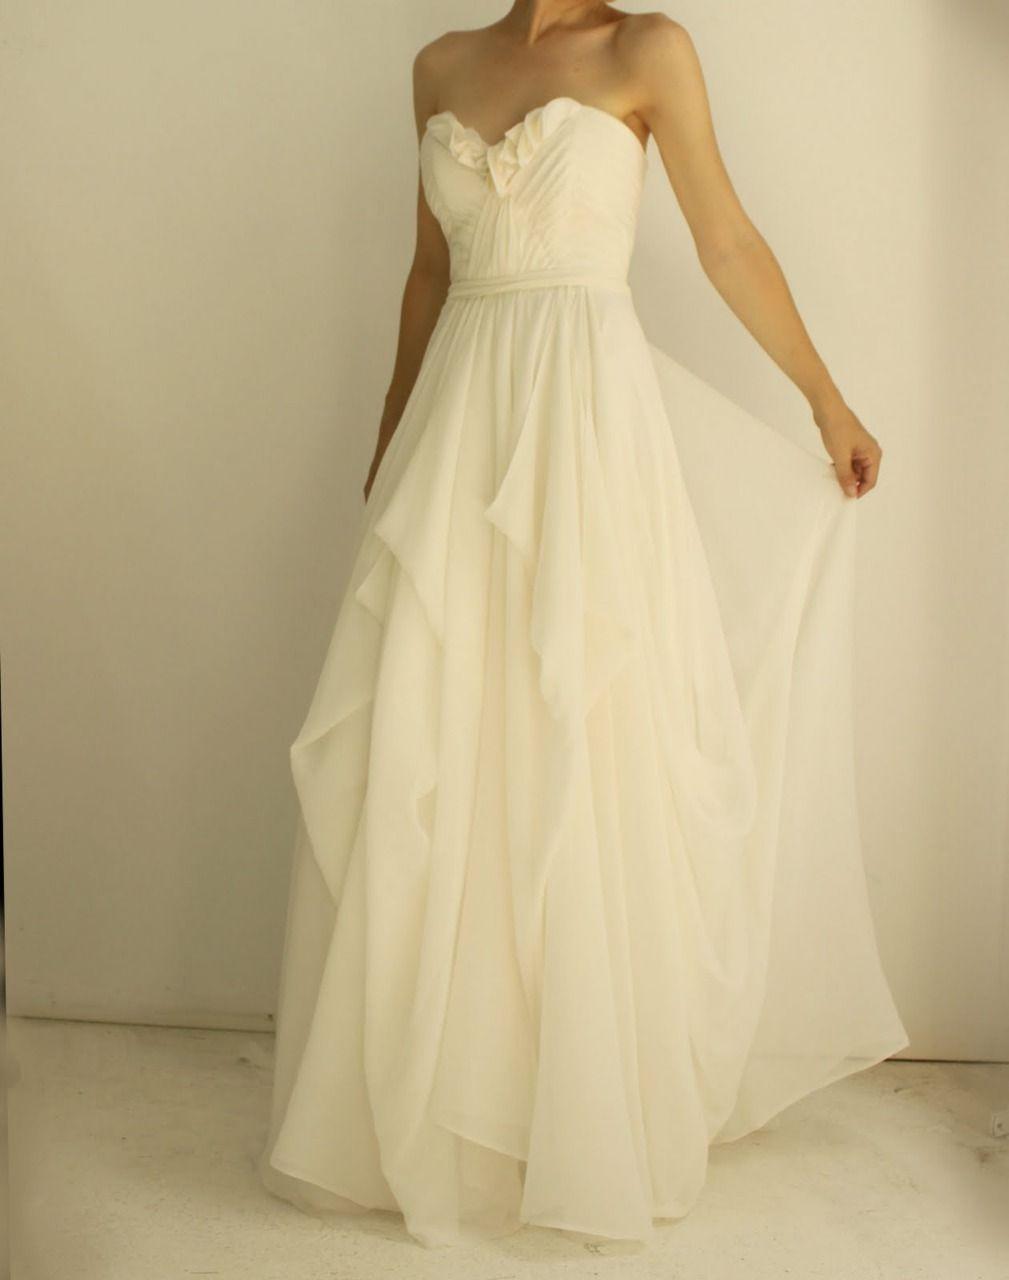 Country girl wedding dress  A Country Girls Wedding Inspirations  Wedding Ideas  Pinterest